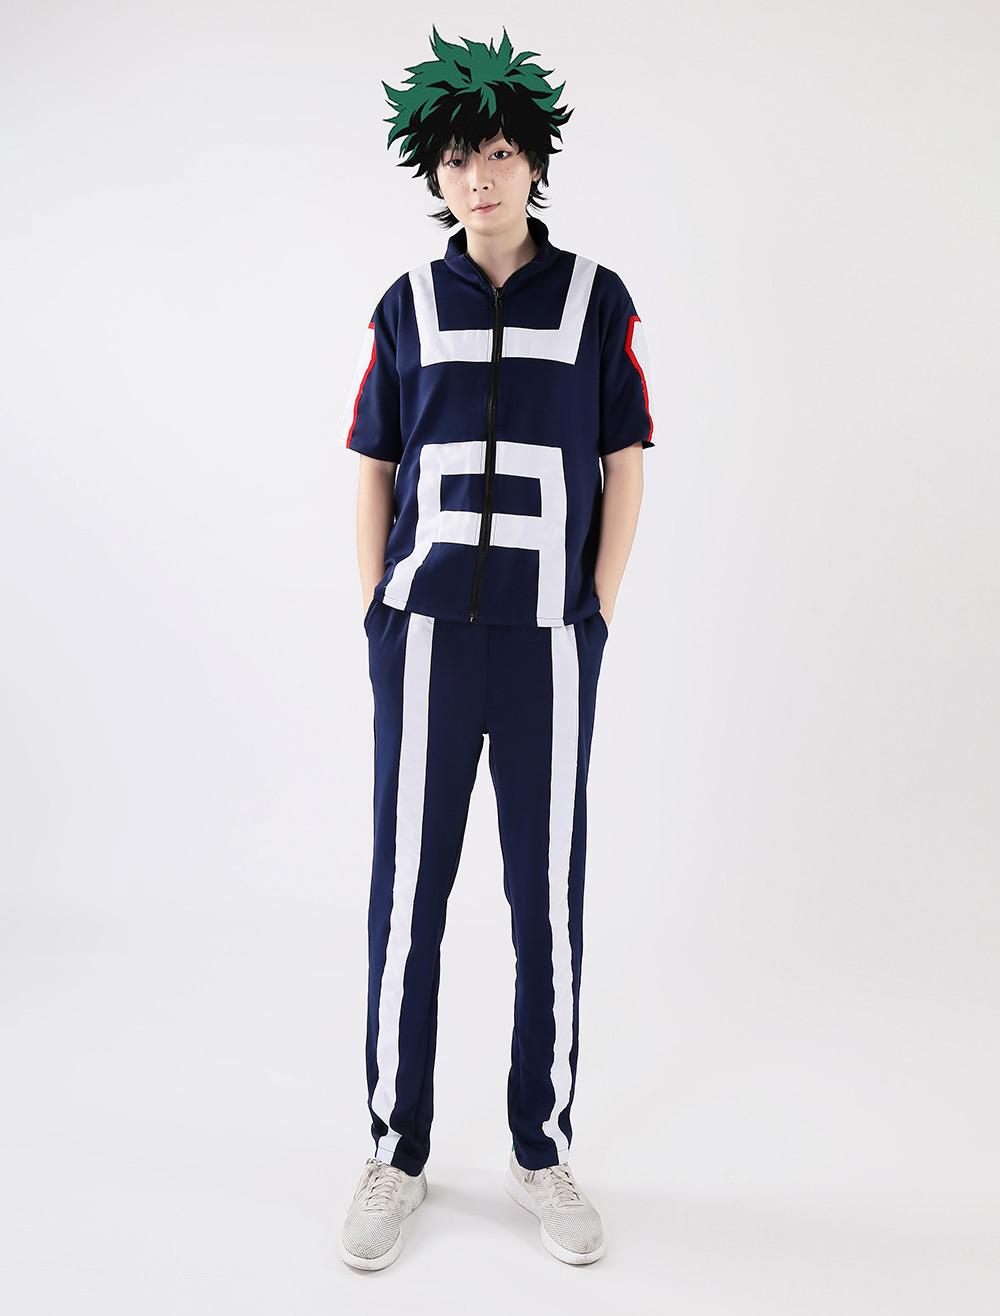 Boku no MY HERO ACADEMIA Midoriya Izuku Cosplay costume Kostüm Uniform Maske v.2